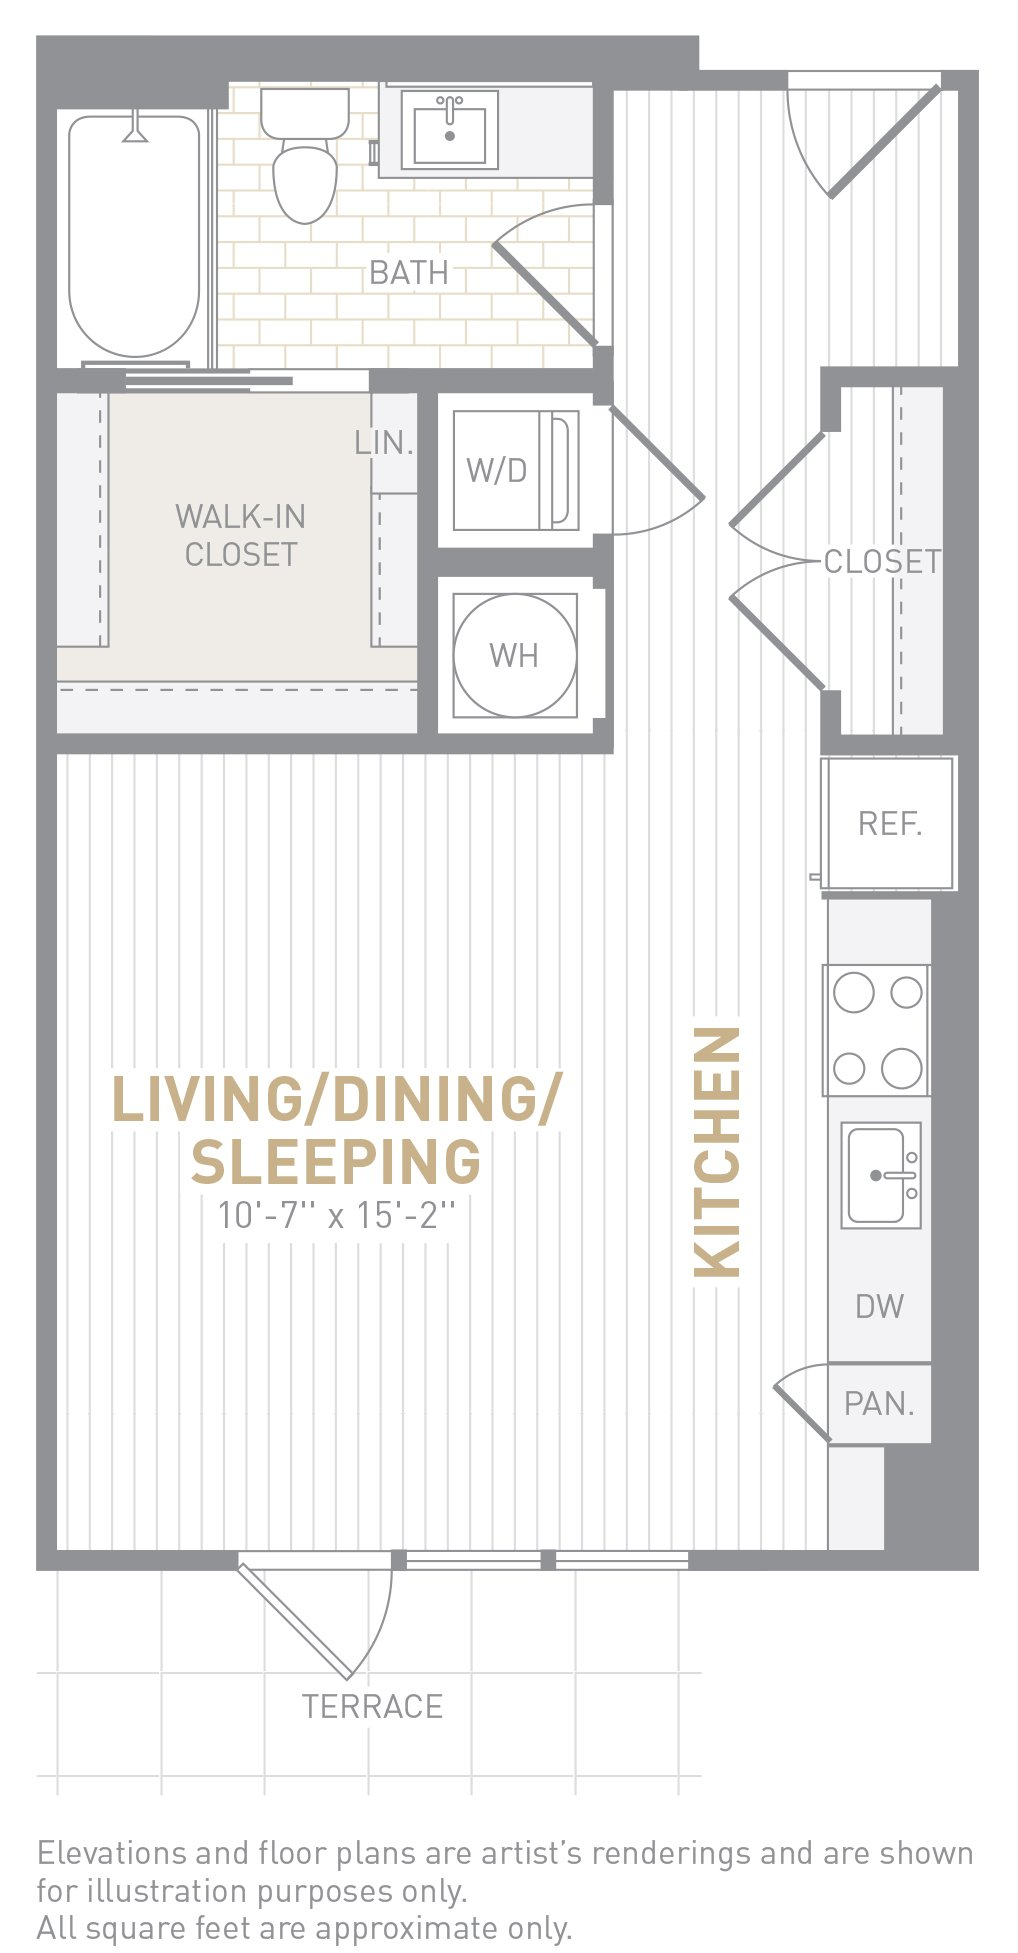 floor image of unit 1107